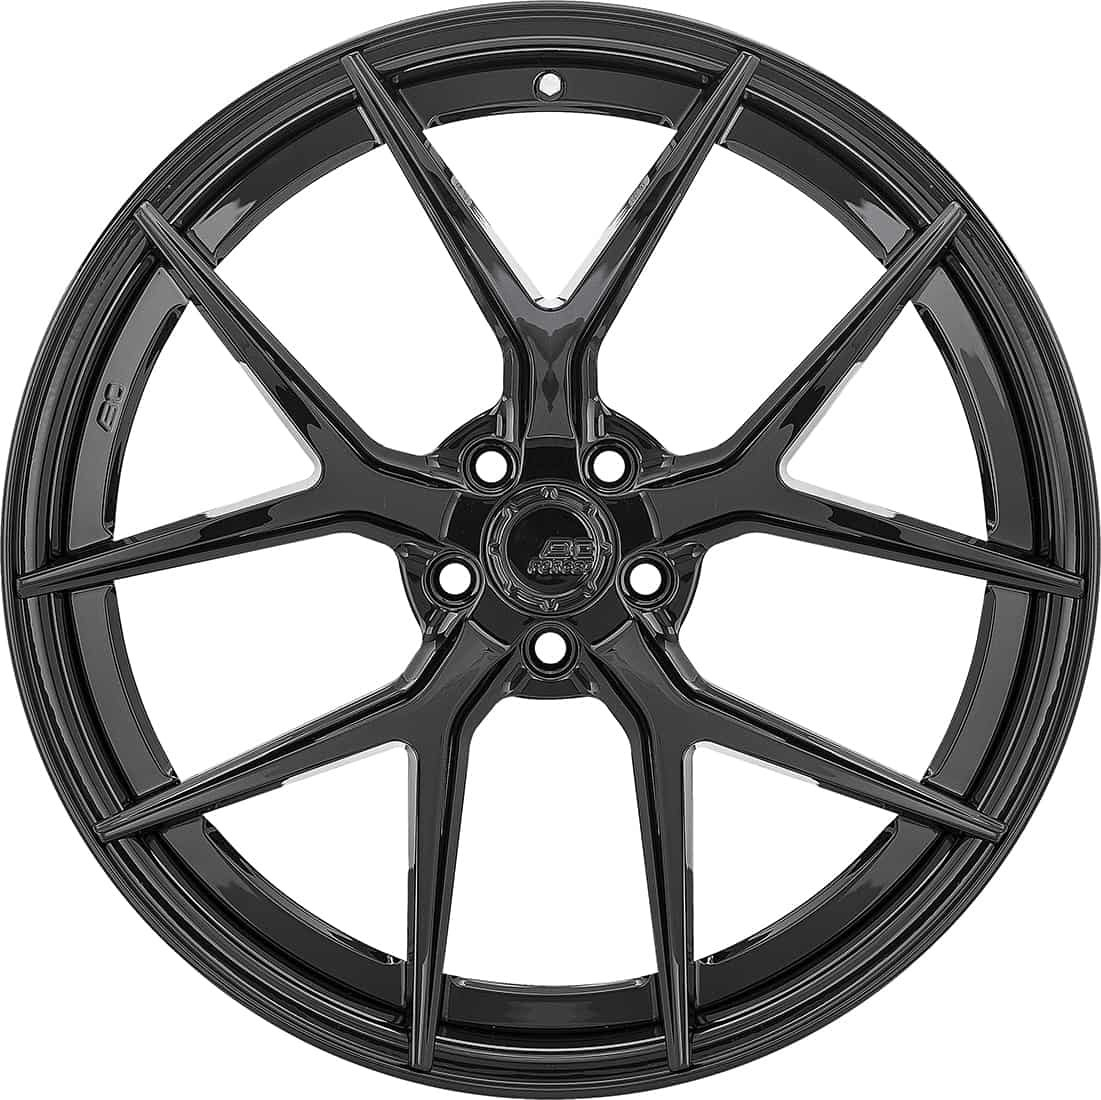 BC Forged wheels HBR2 (HBR Series)